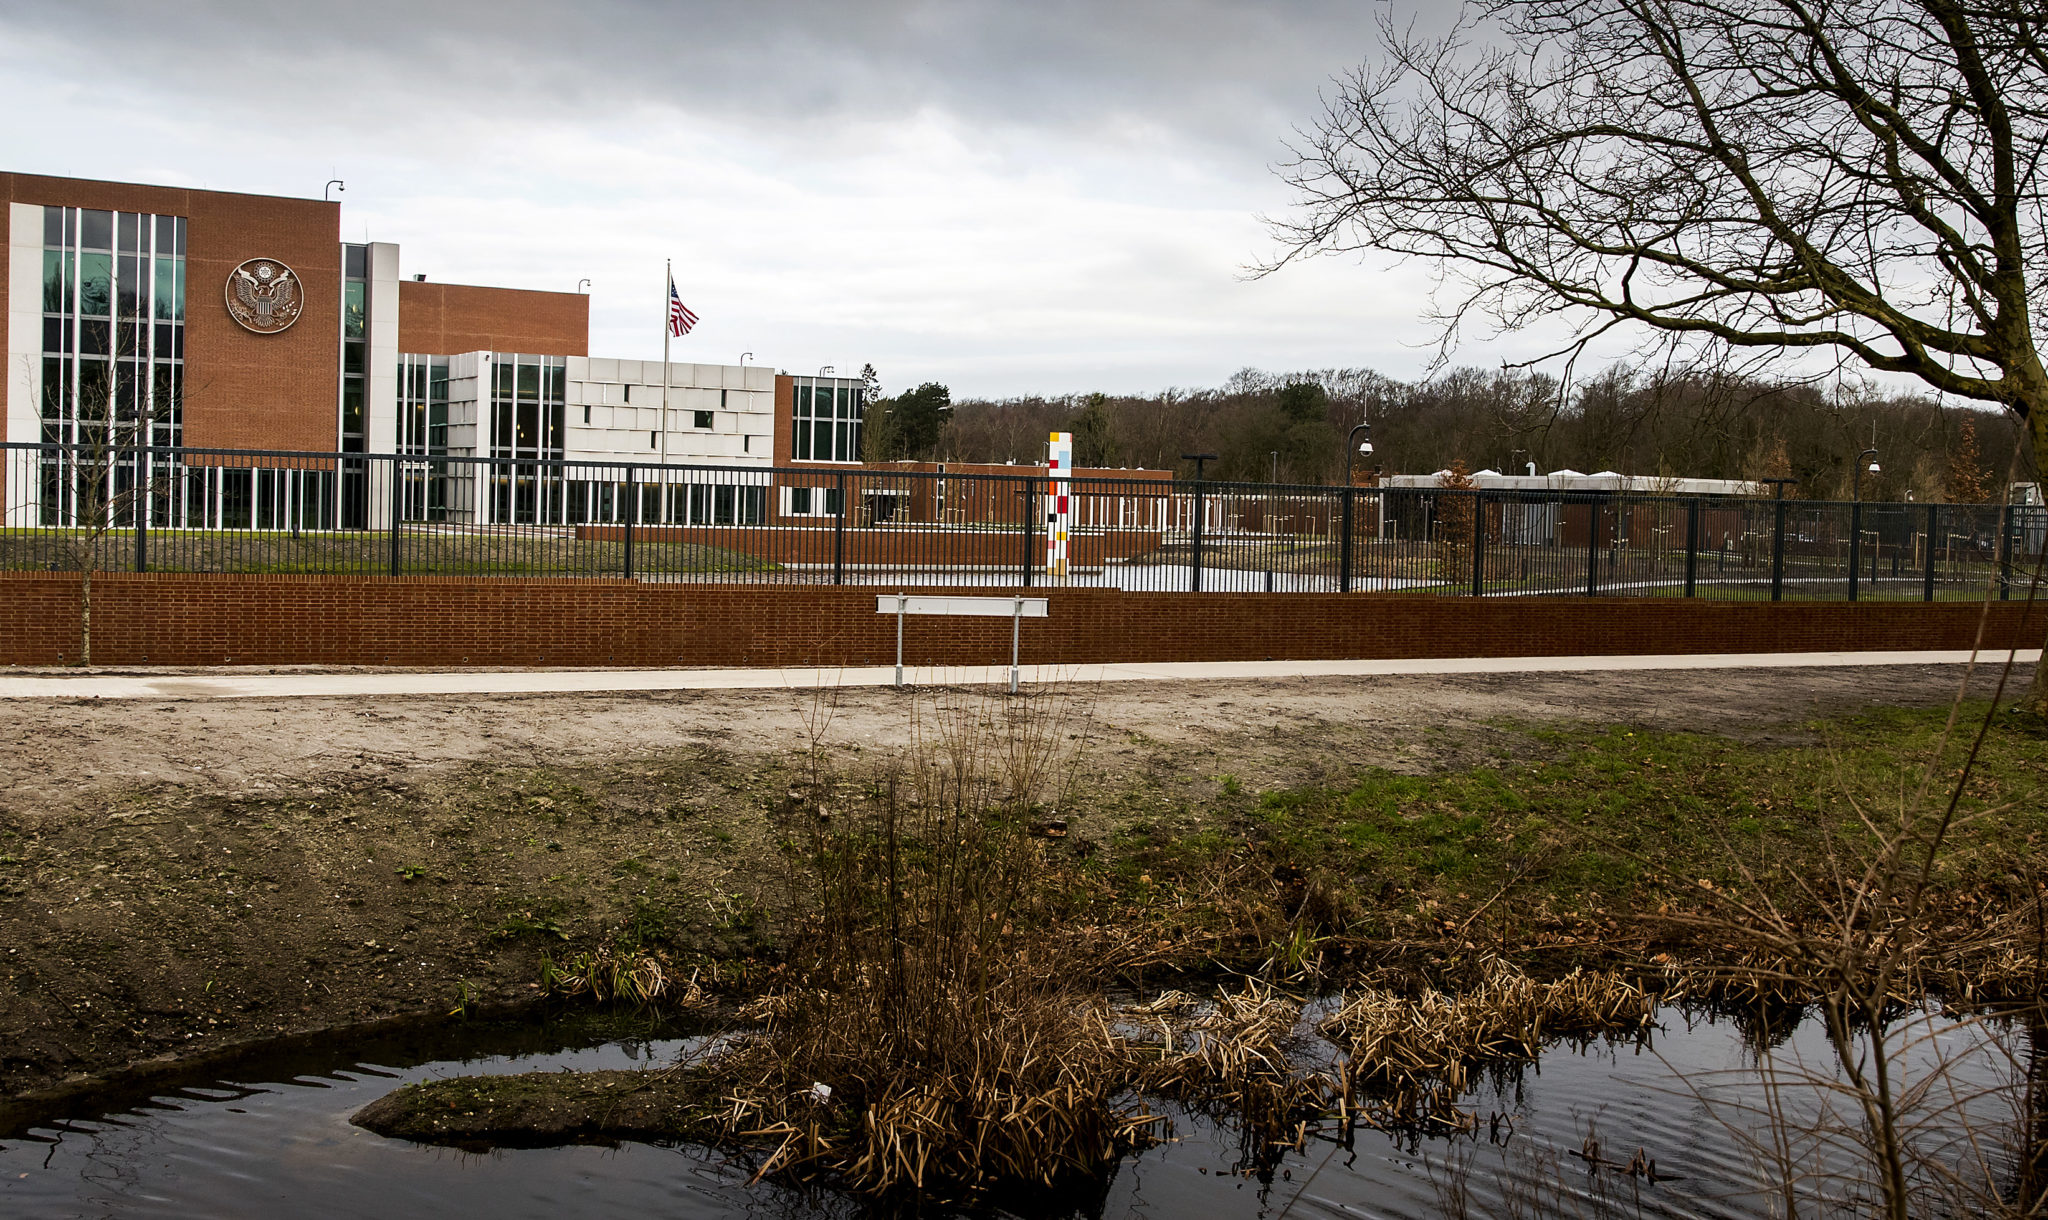 Amerikaanse ambassade verhuisd naar wassenaar